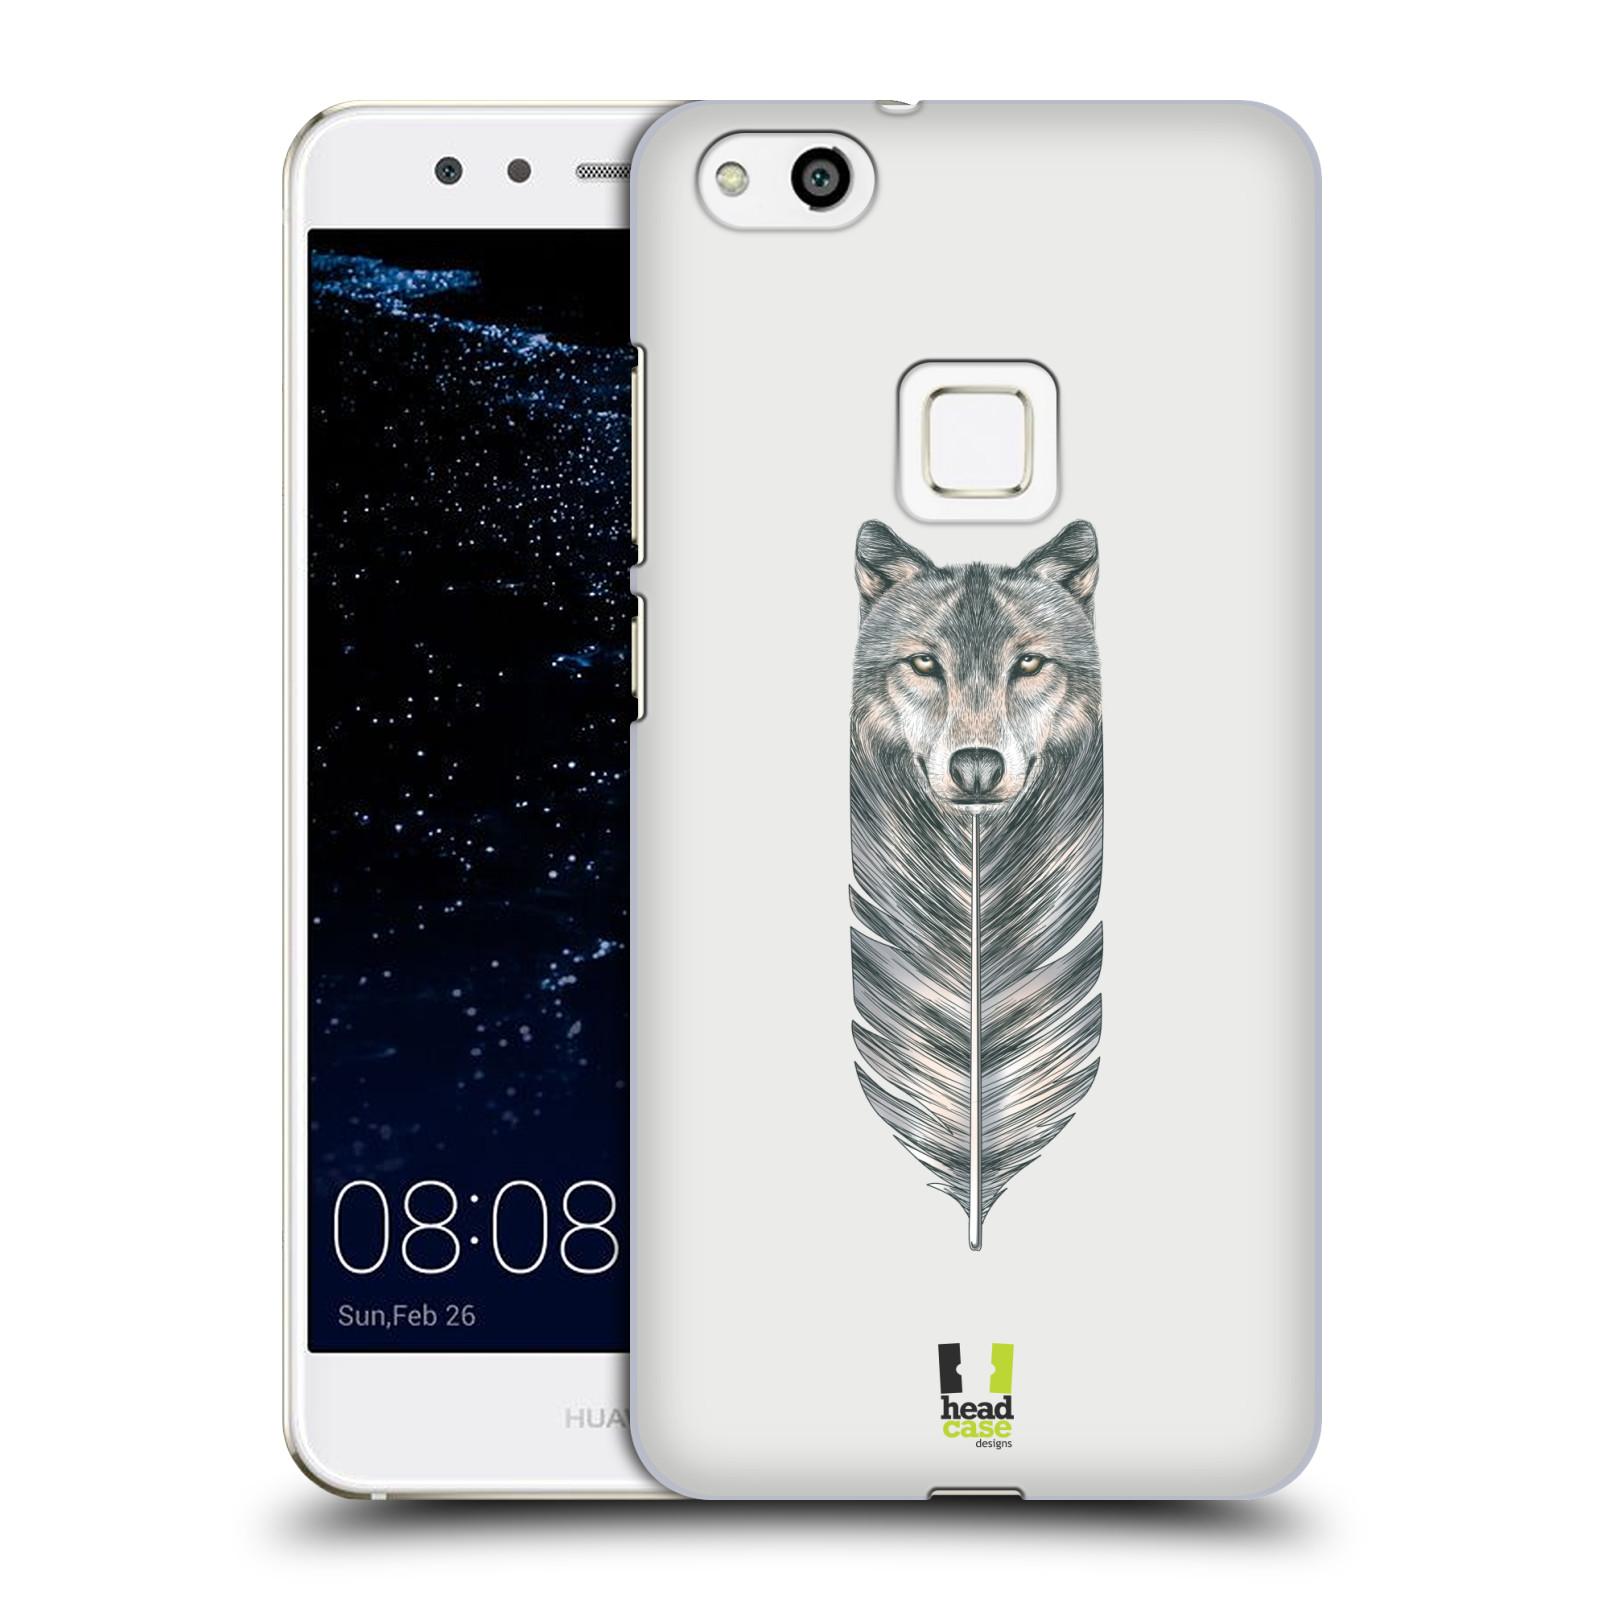 Plastové pouzdro na mobil Huawei P10 Lite Head Case - PÍRKO VLK (Plastový kryt či obal na mobilní telefon Huawei P10 Lite Dual SIM (LX1/LX1A))